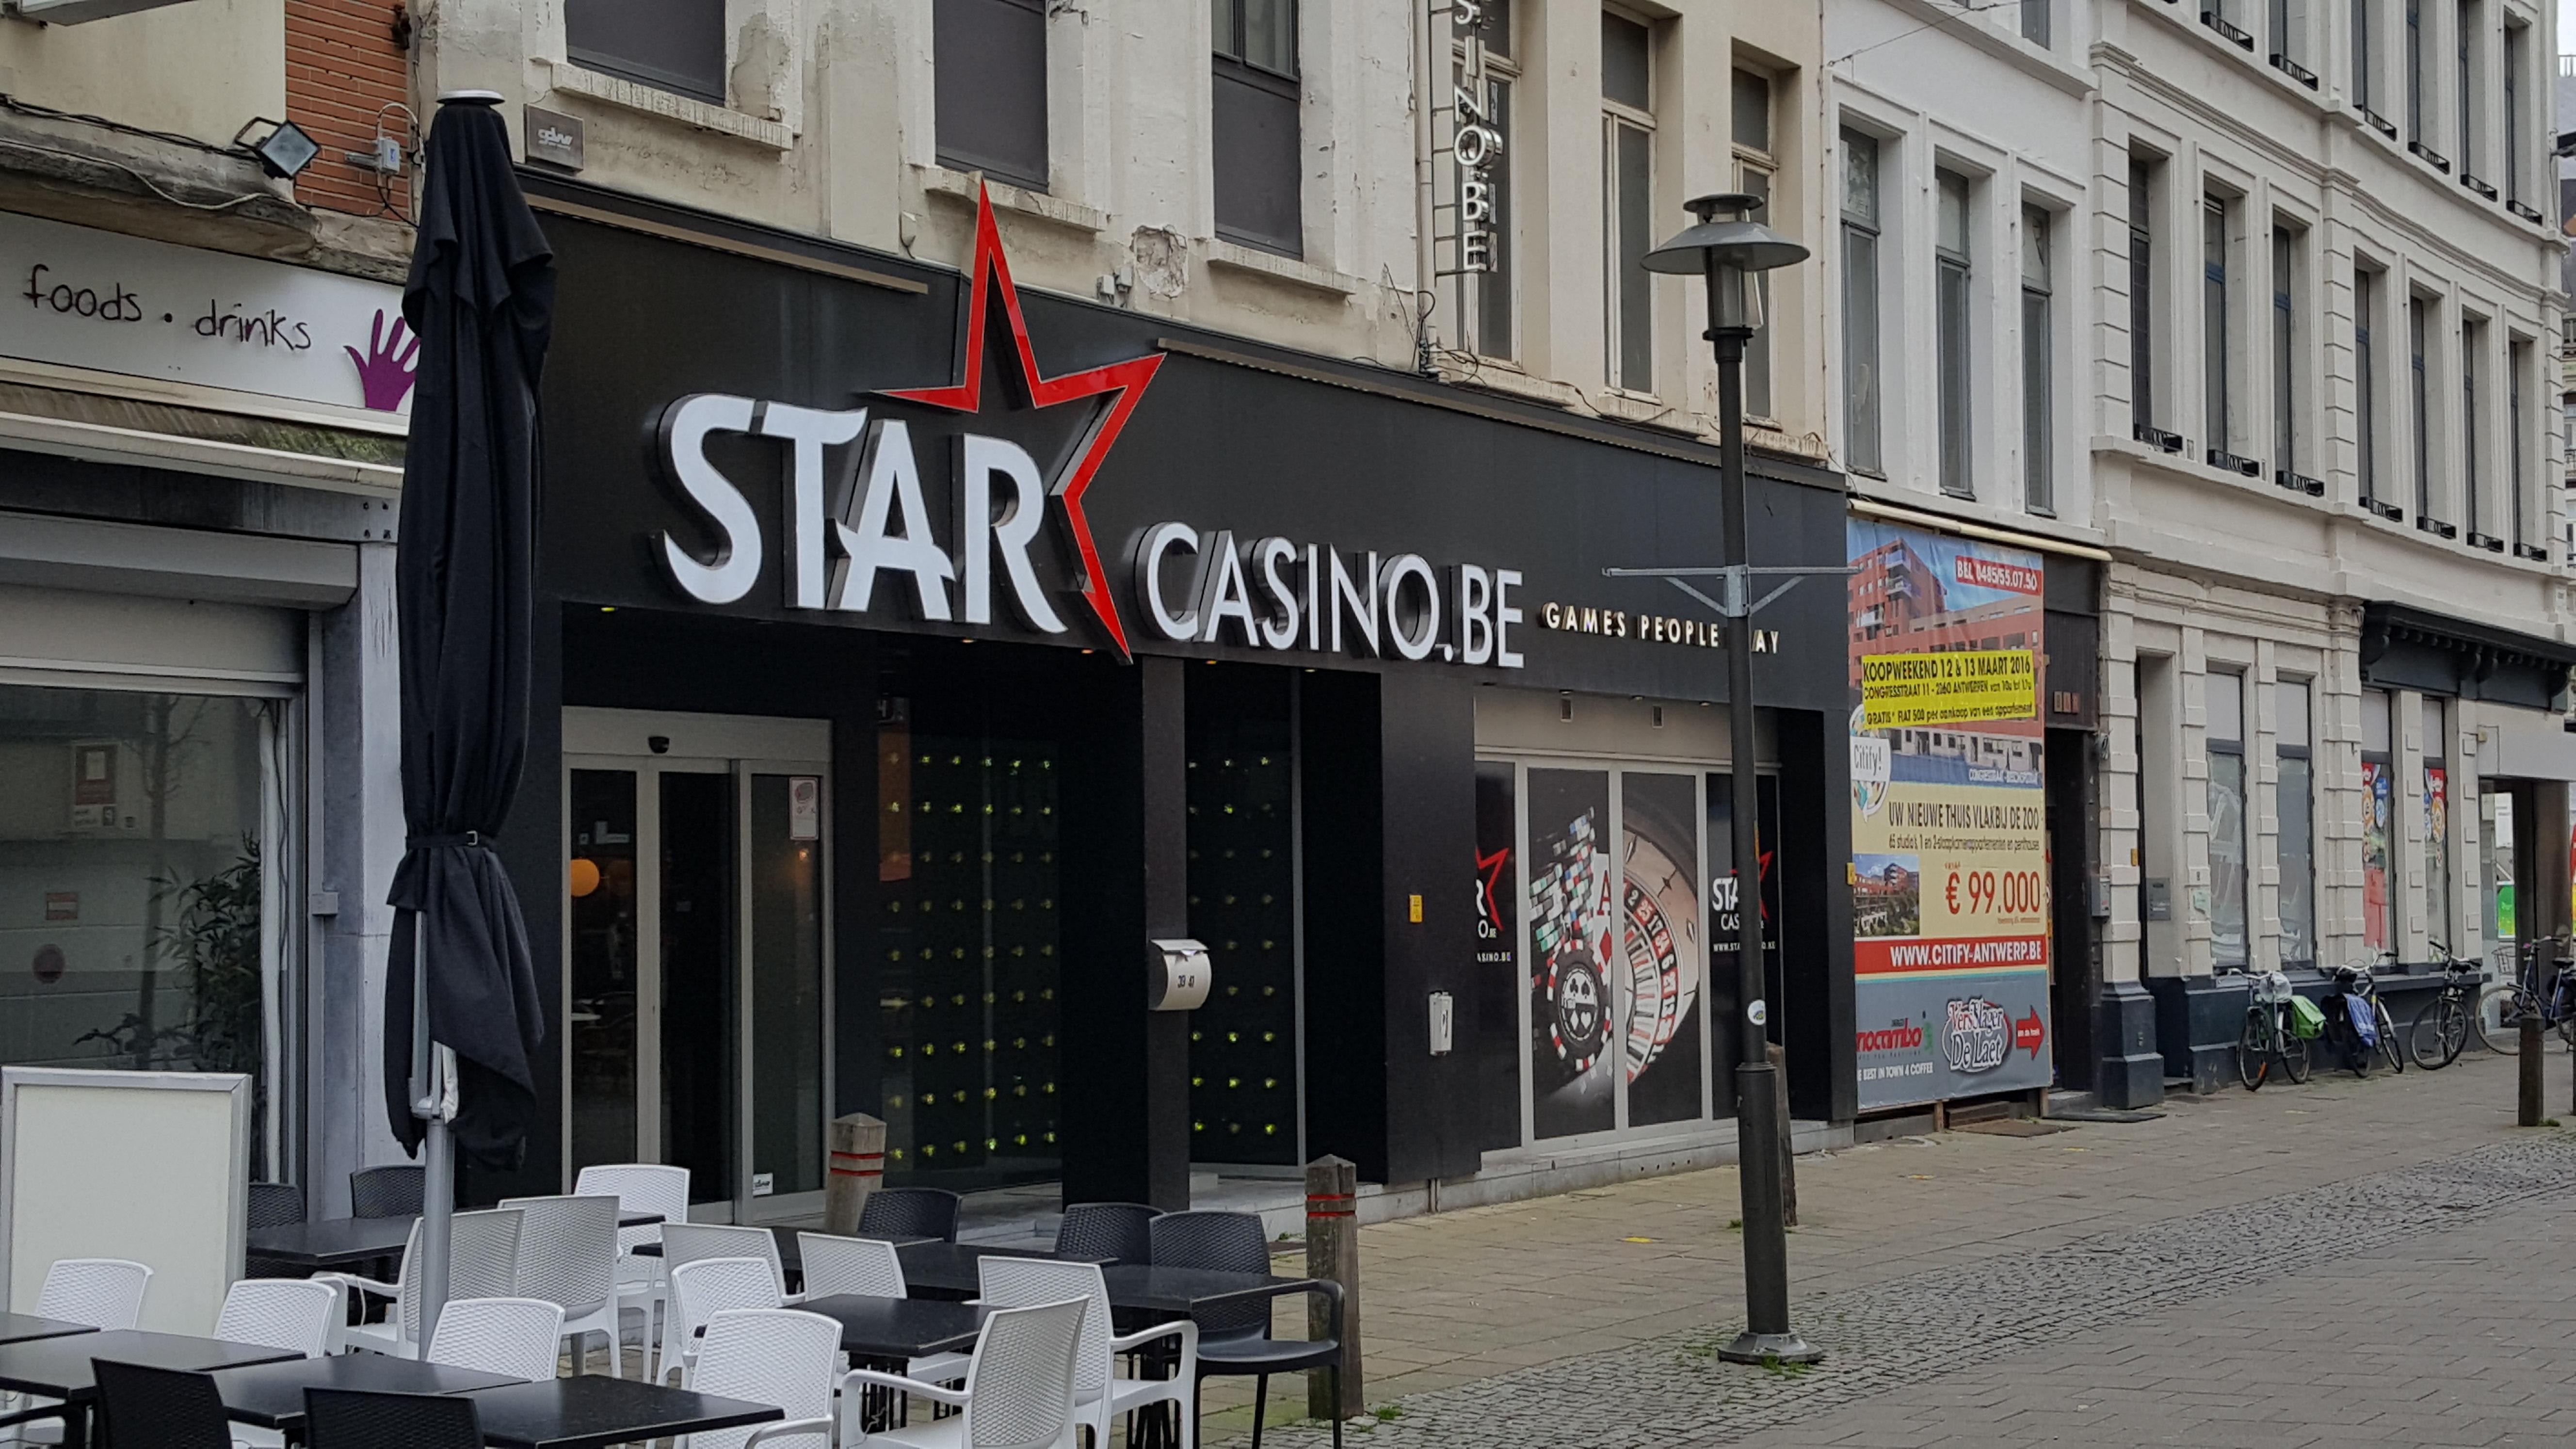 StarCasino speelhal